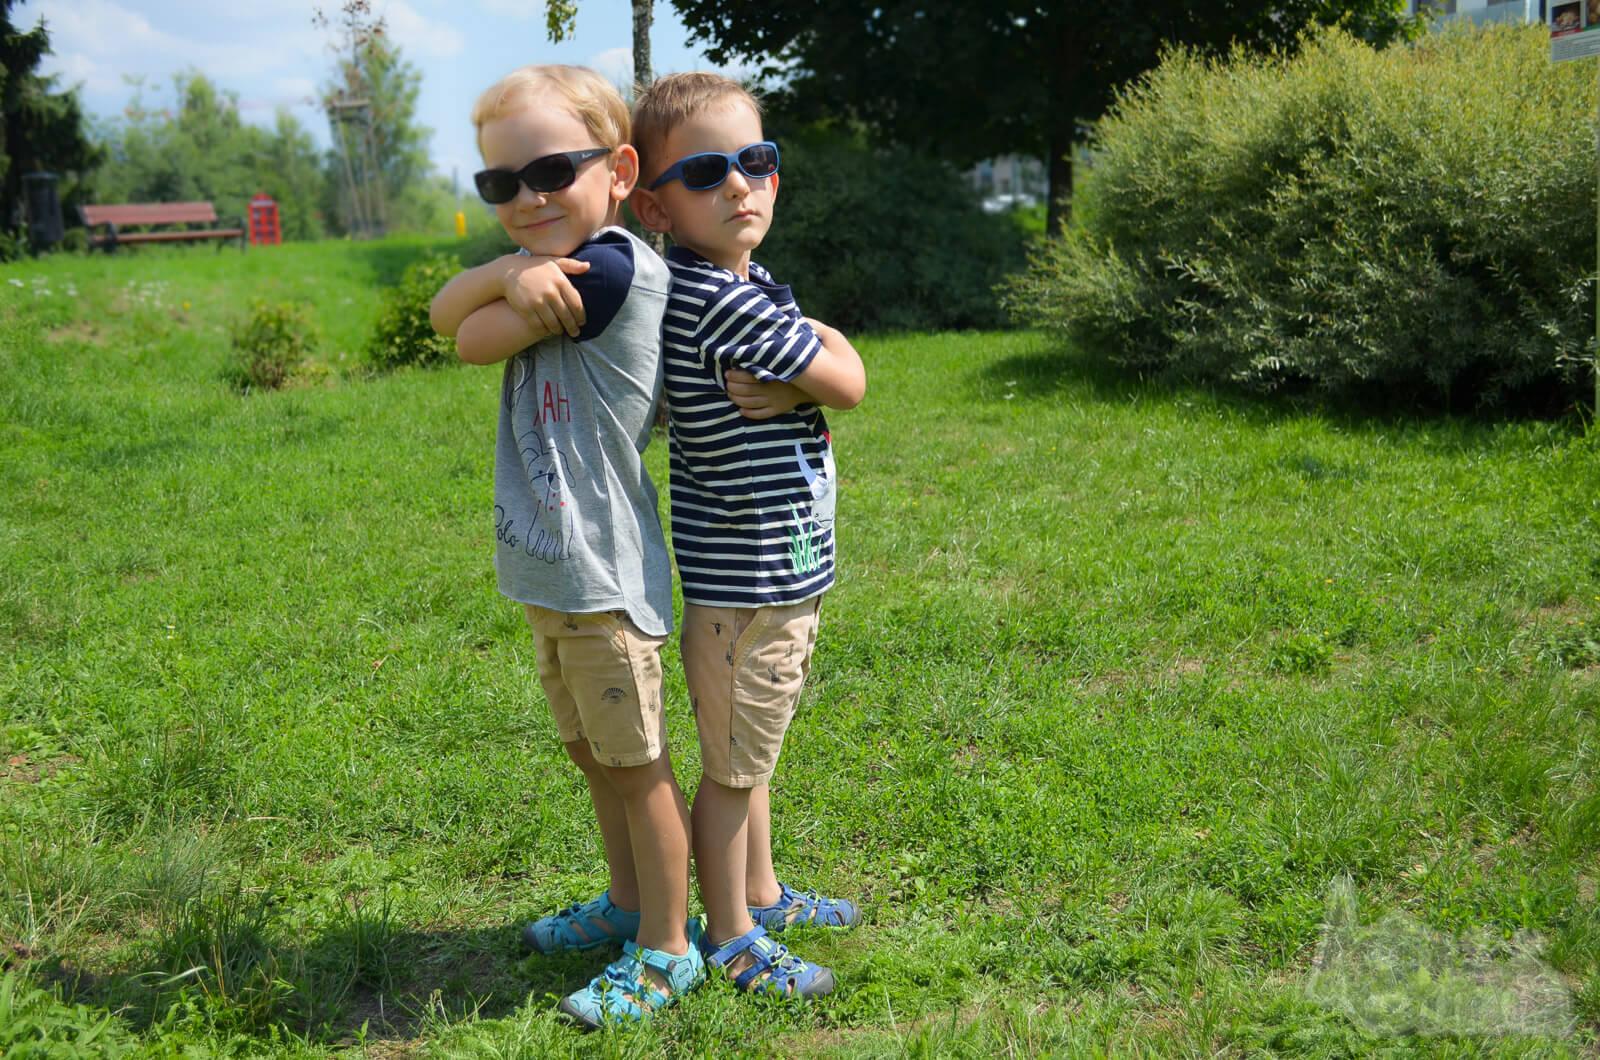 Jak odróżnić bliźnięta